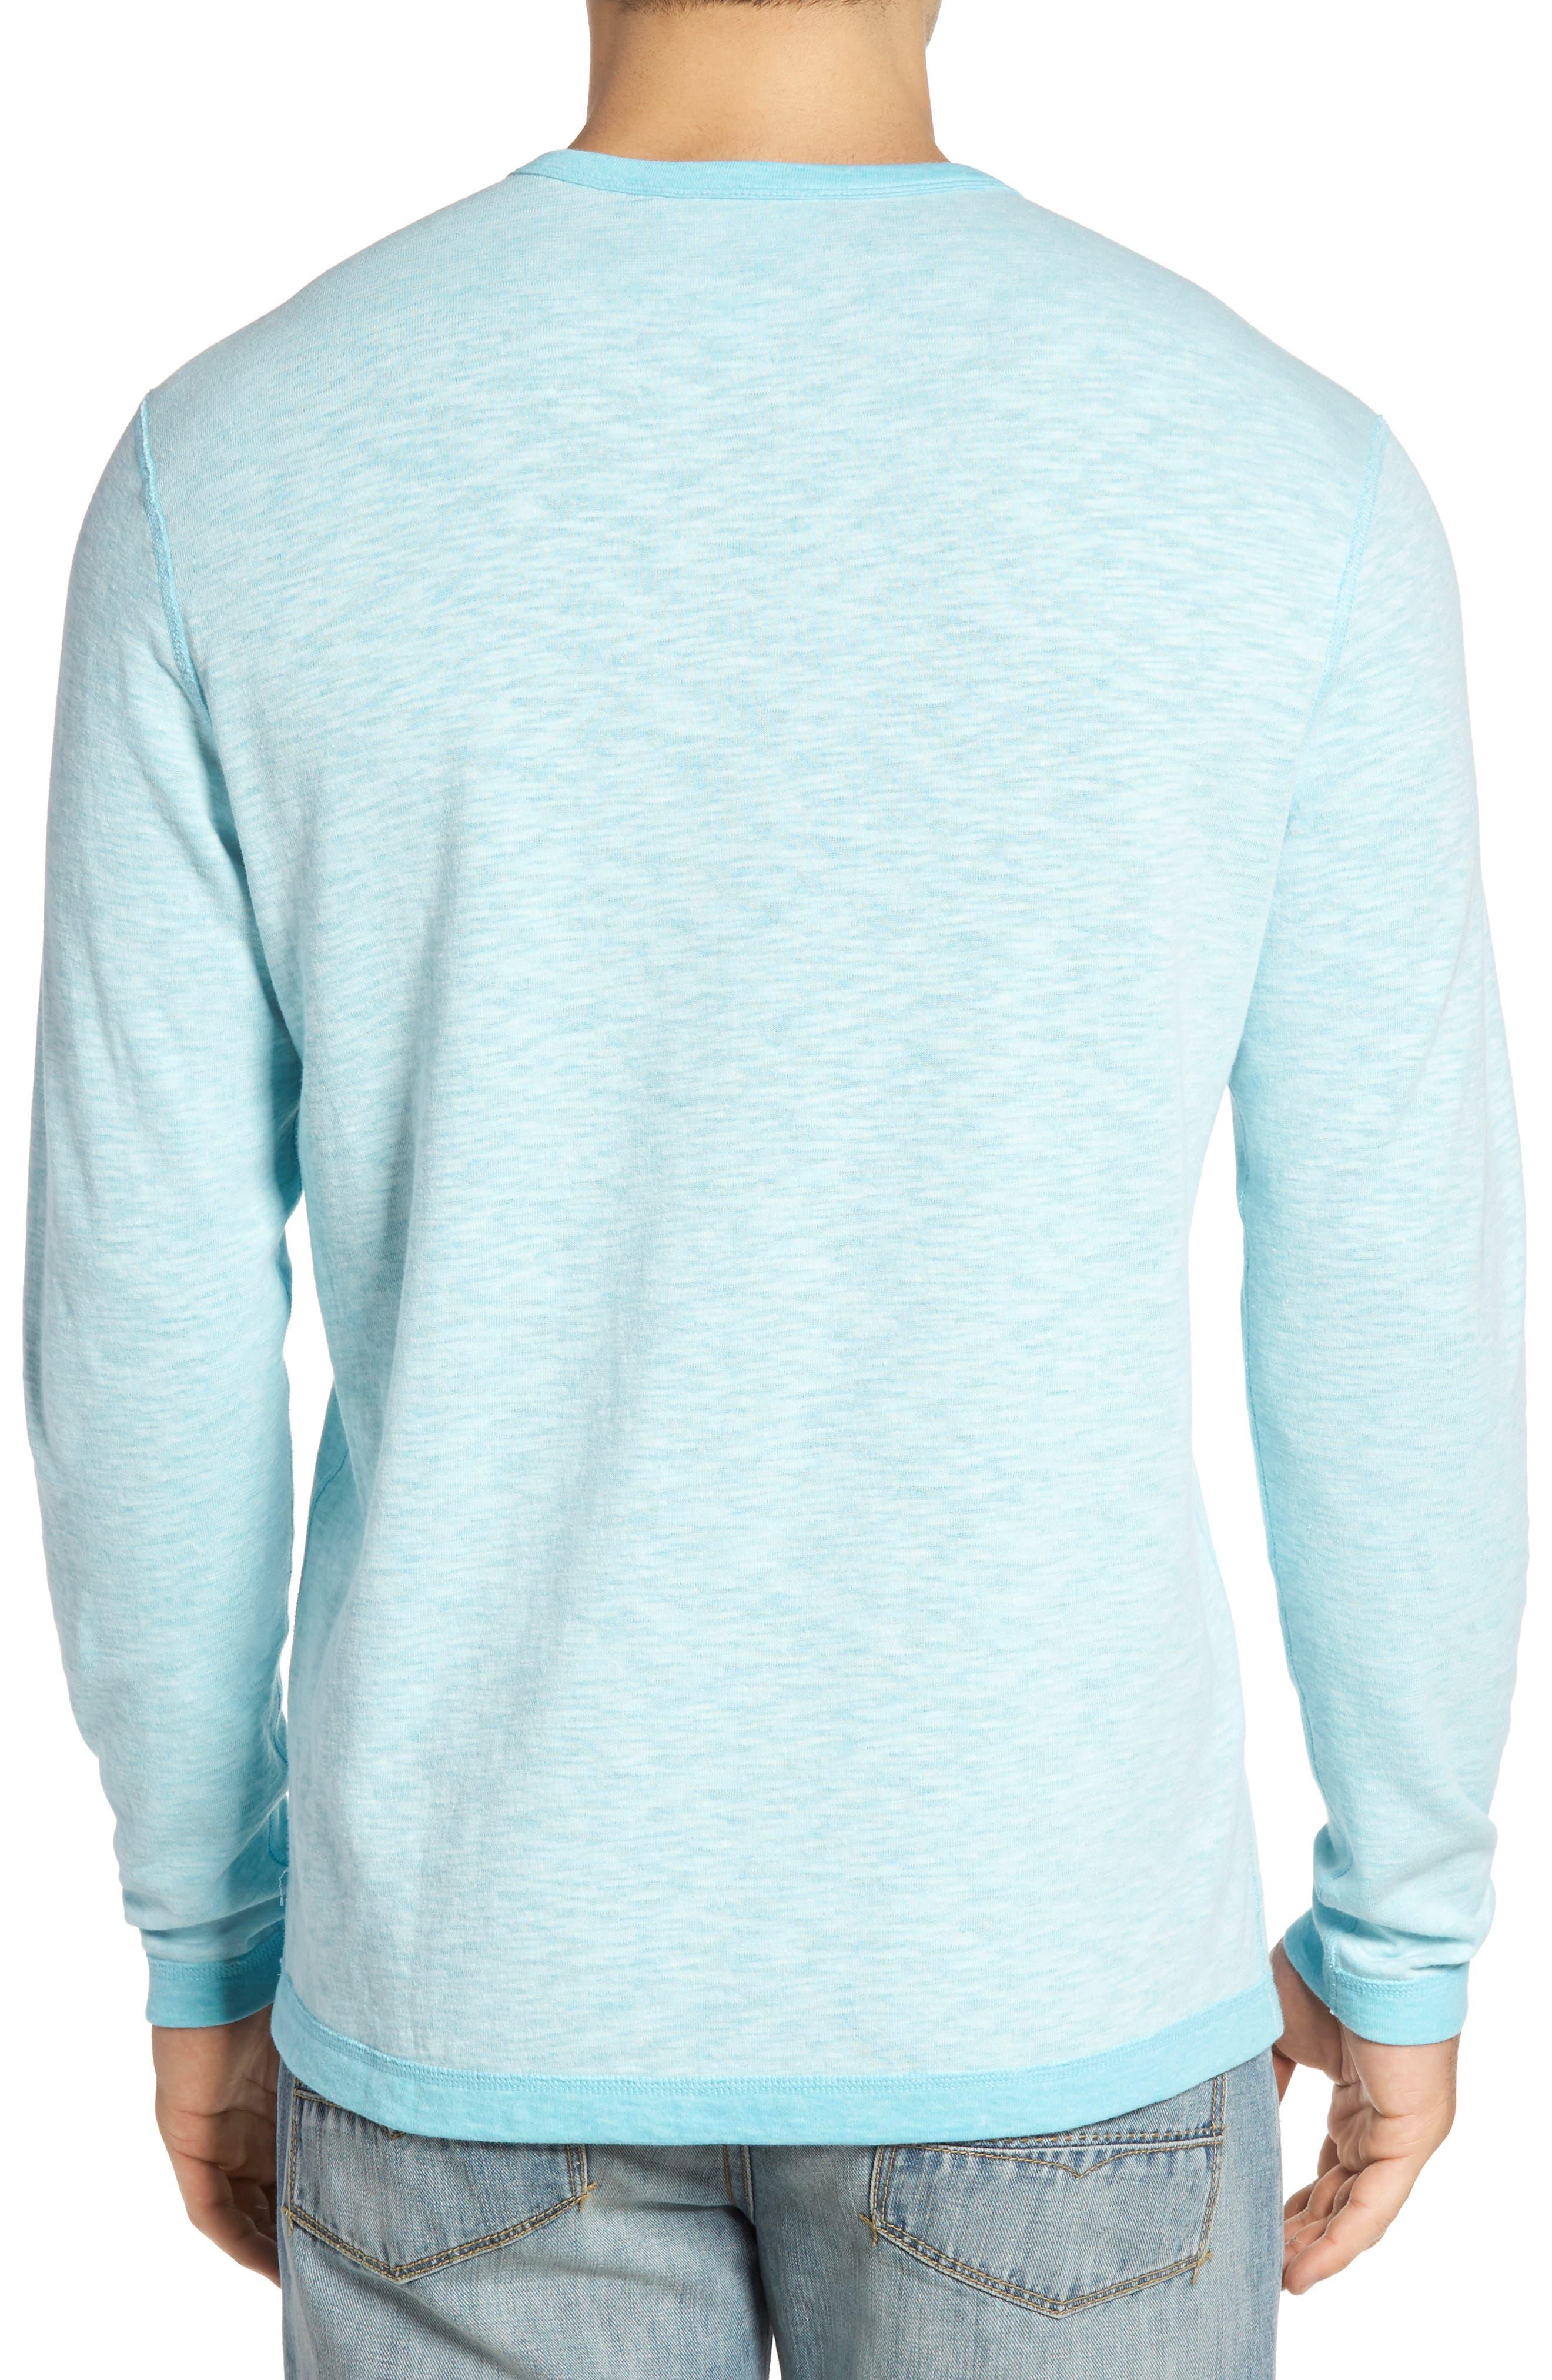 Alternate Image 2  - Tommy Bahama Seaglass Reversible T-Shirt